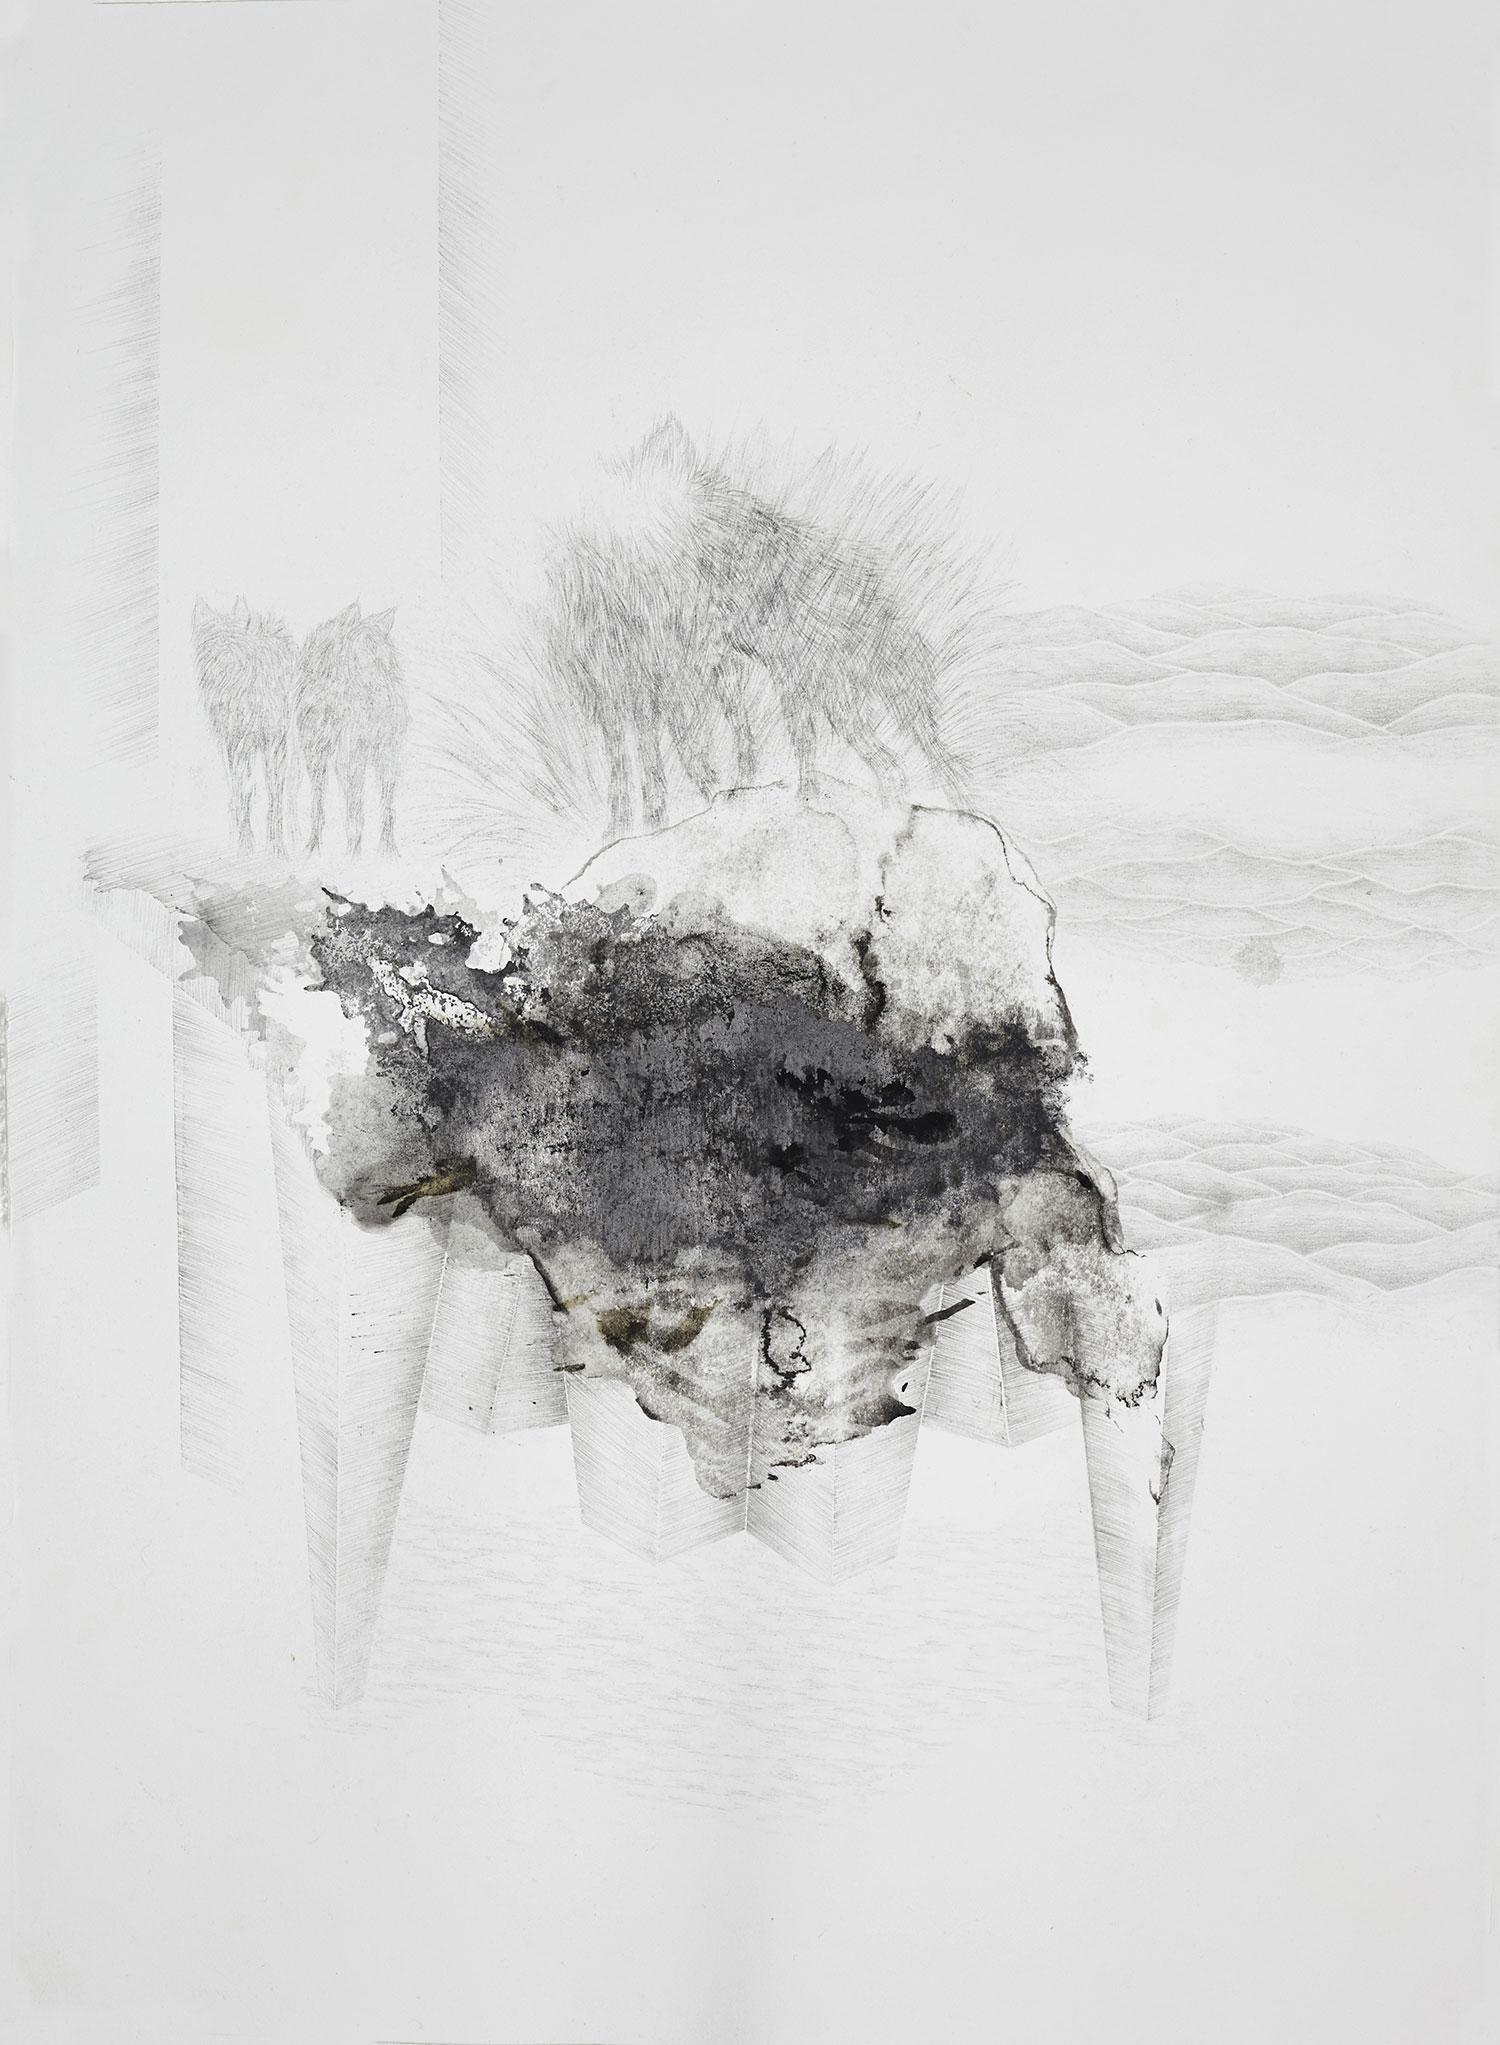 <i>les instincts</i>, 2015, graphite et lavis, 76x56cm